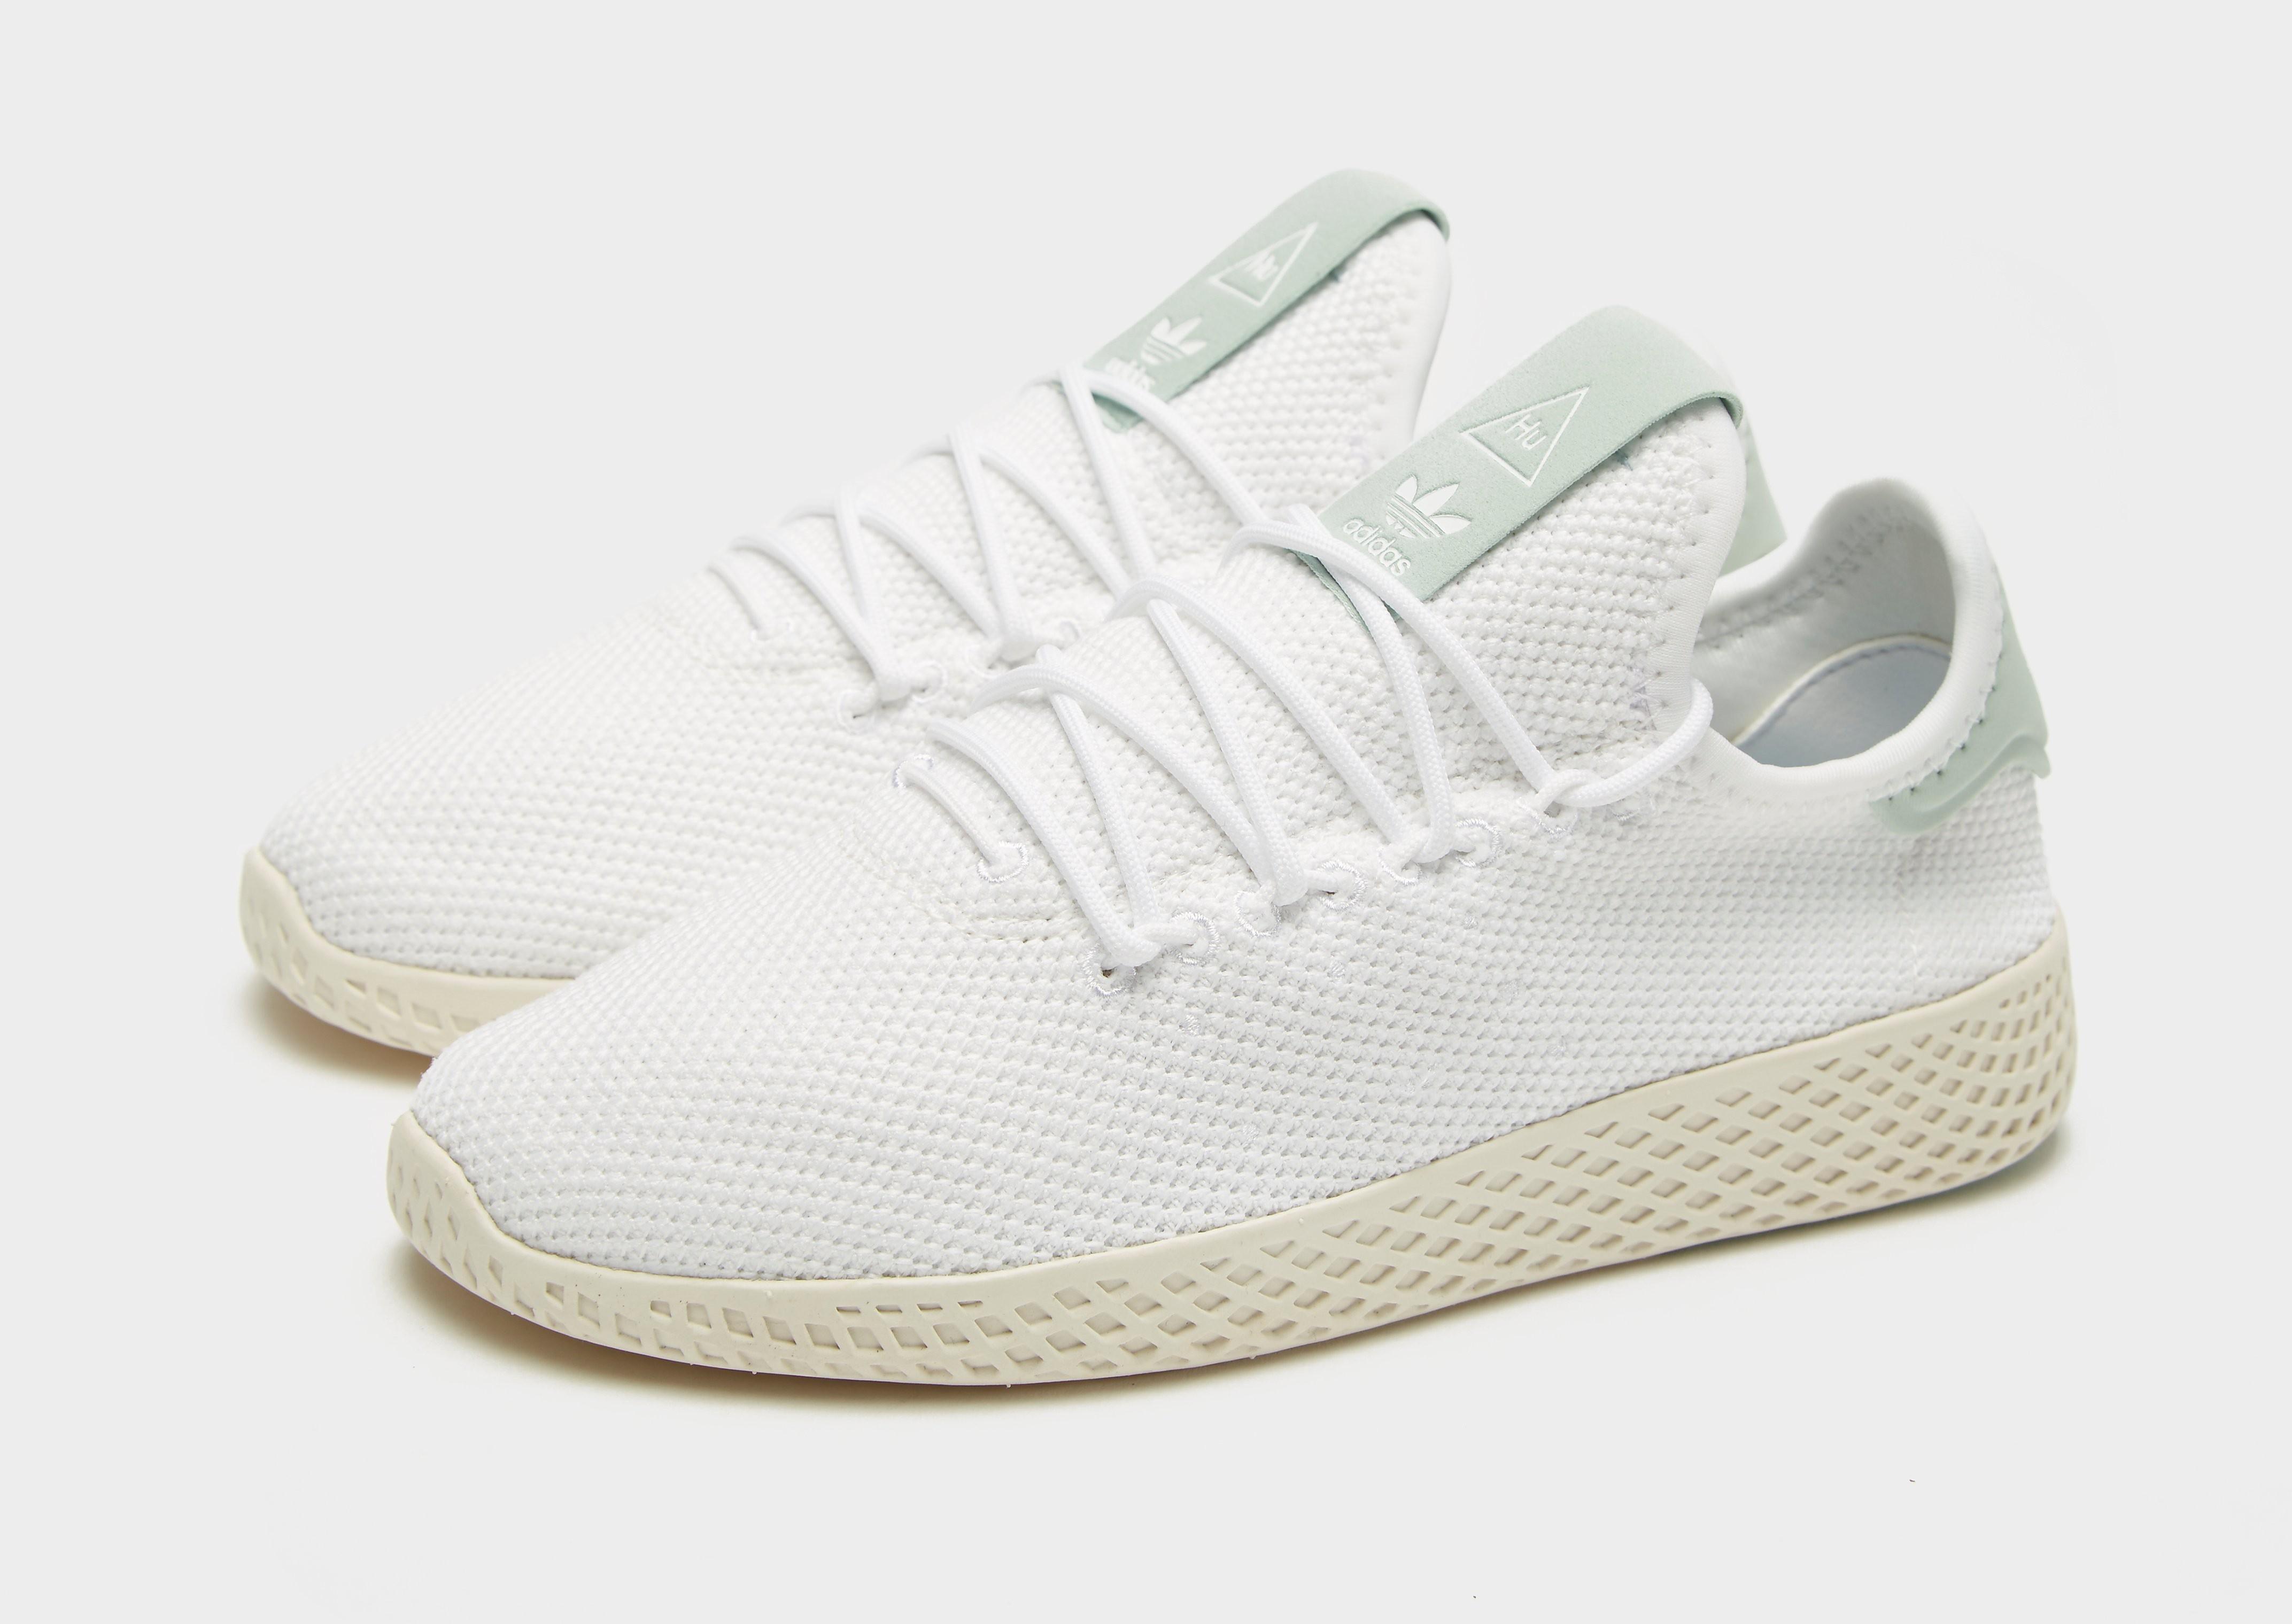 adidas Originals x Pharrell Williams Tennis Hu Children